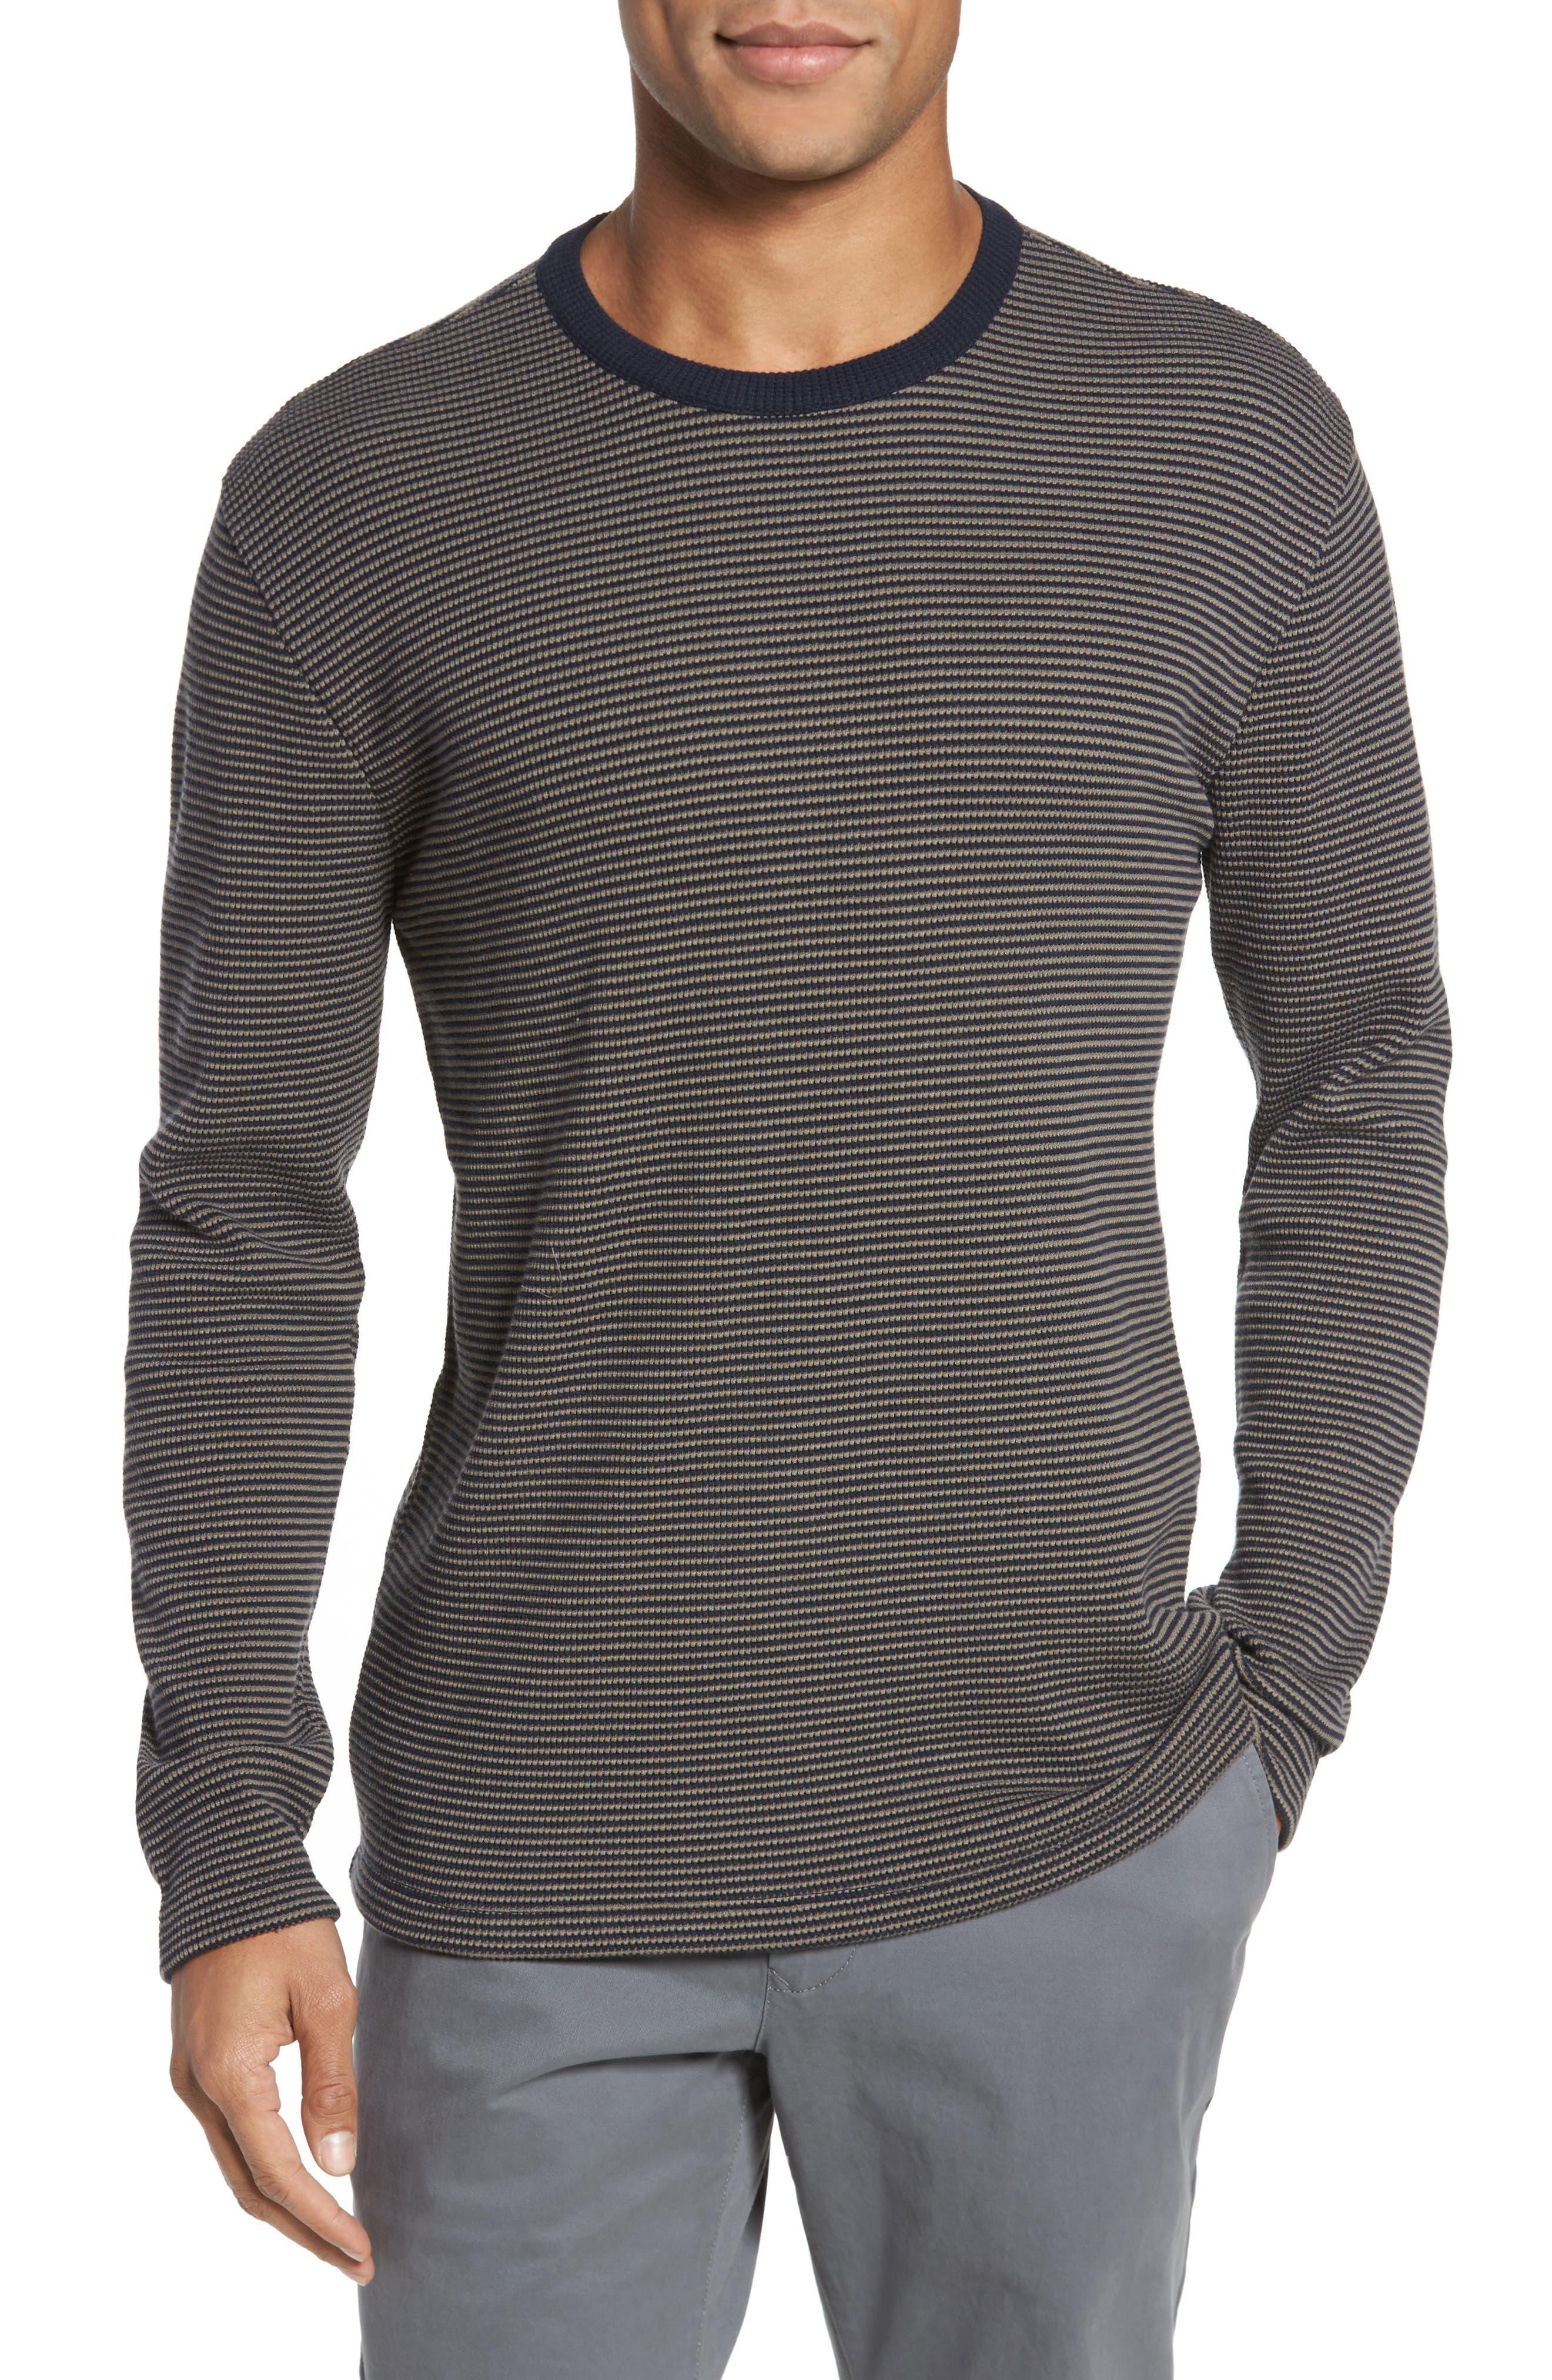 Alternate Image 1 Selected - Bonobos Slim Fit Waffle Knit T-Shirt